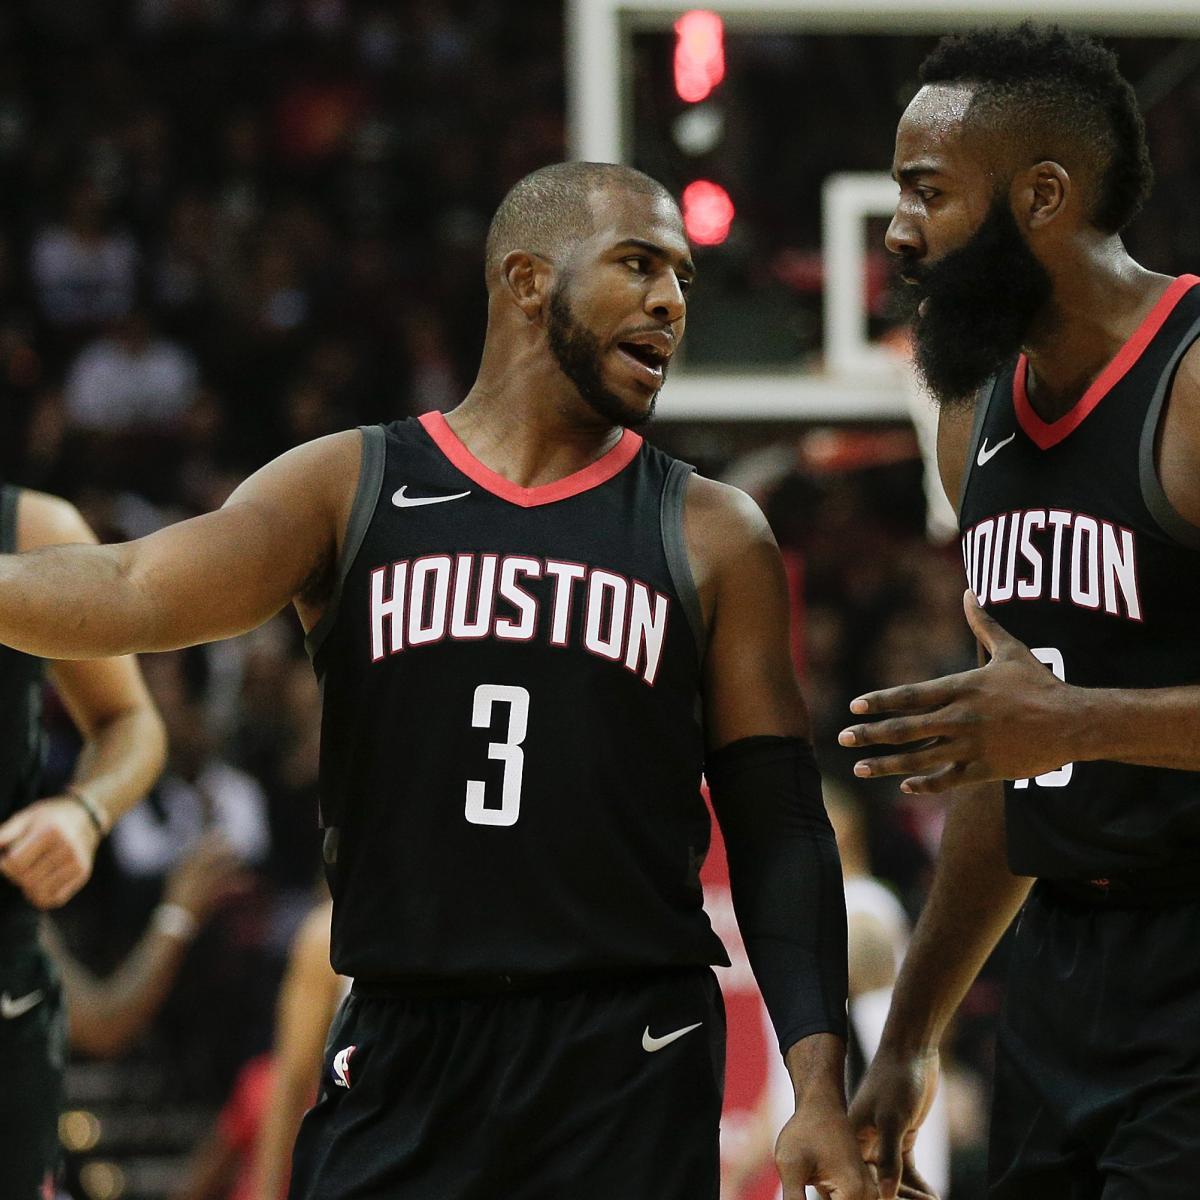 Houston Rockets Win Last Night: Houston Rockets Win In Never-Before-Seen Fashion Monday